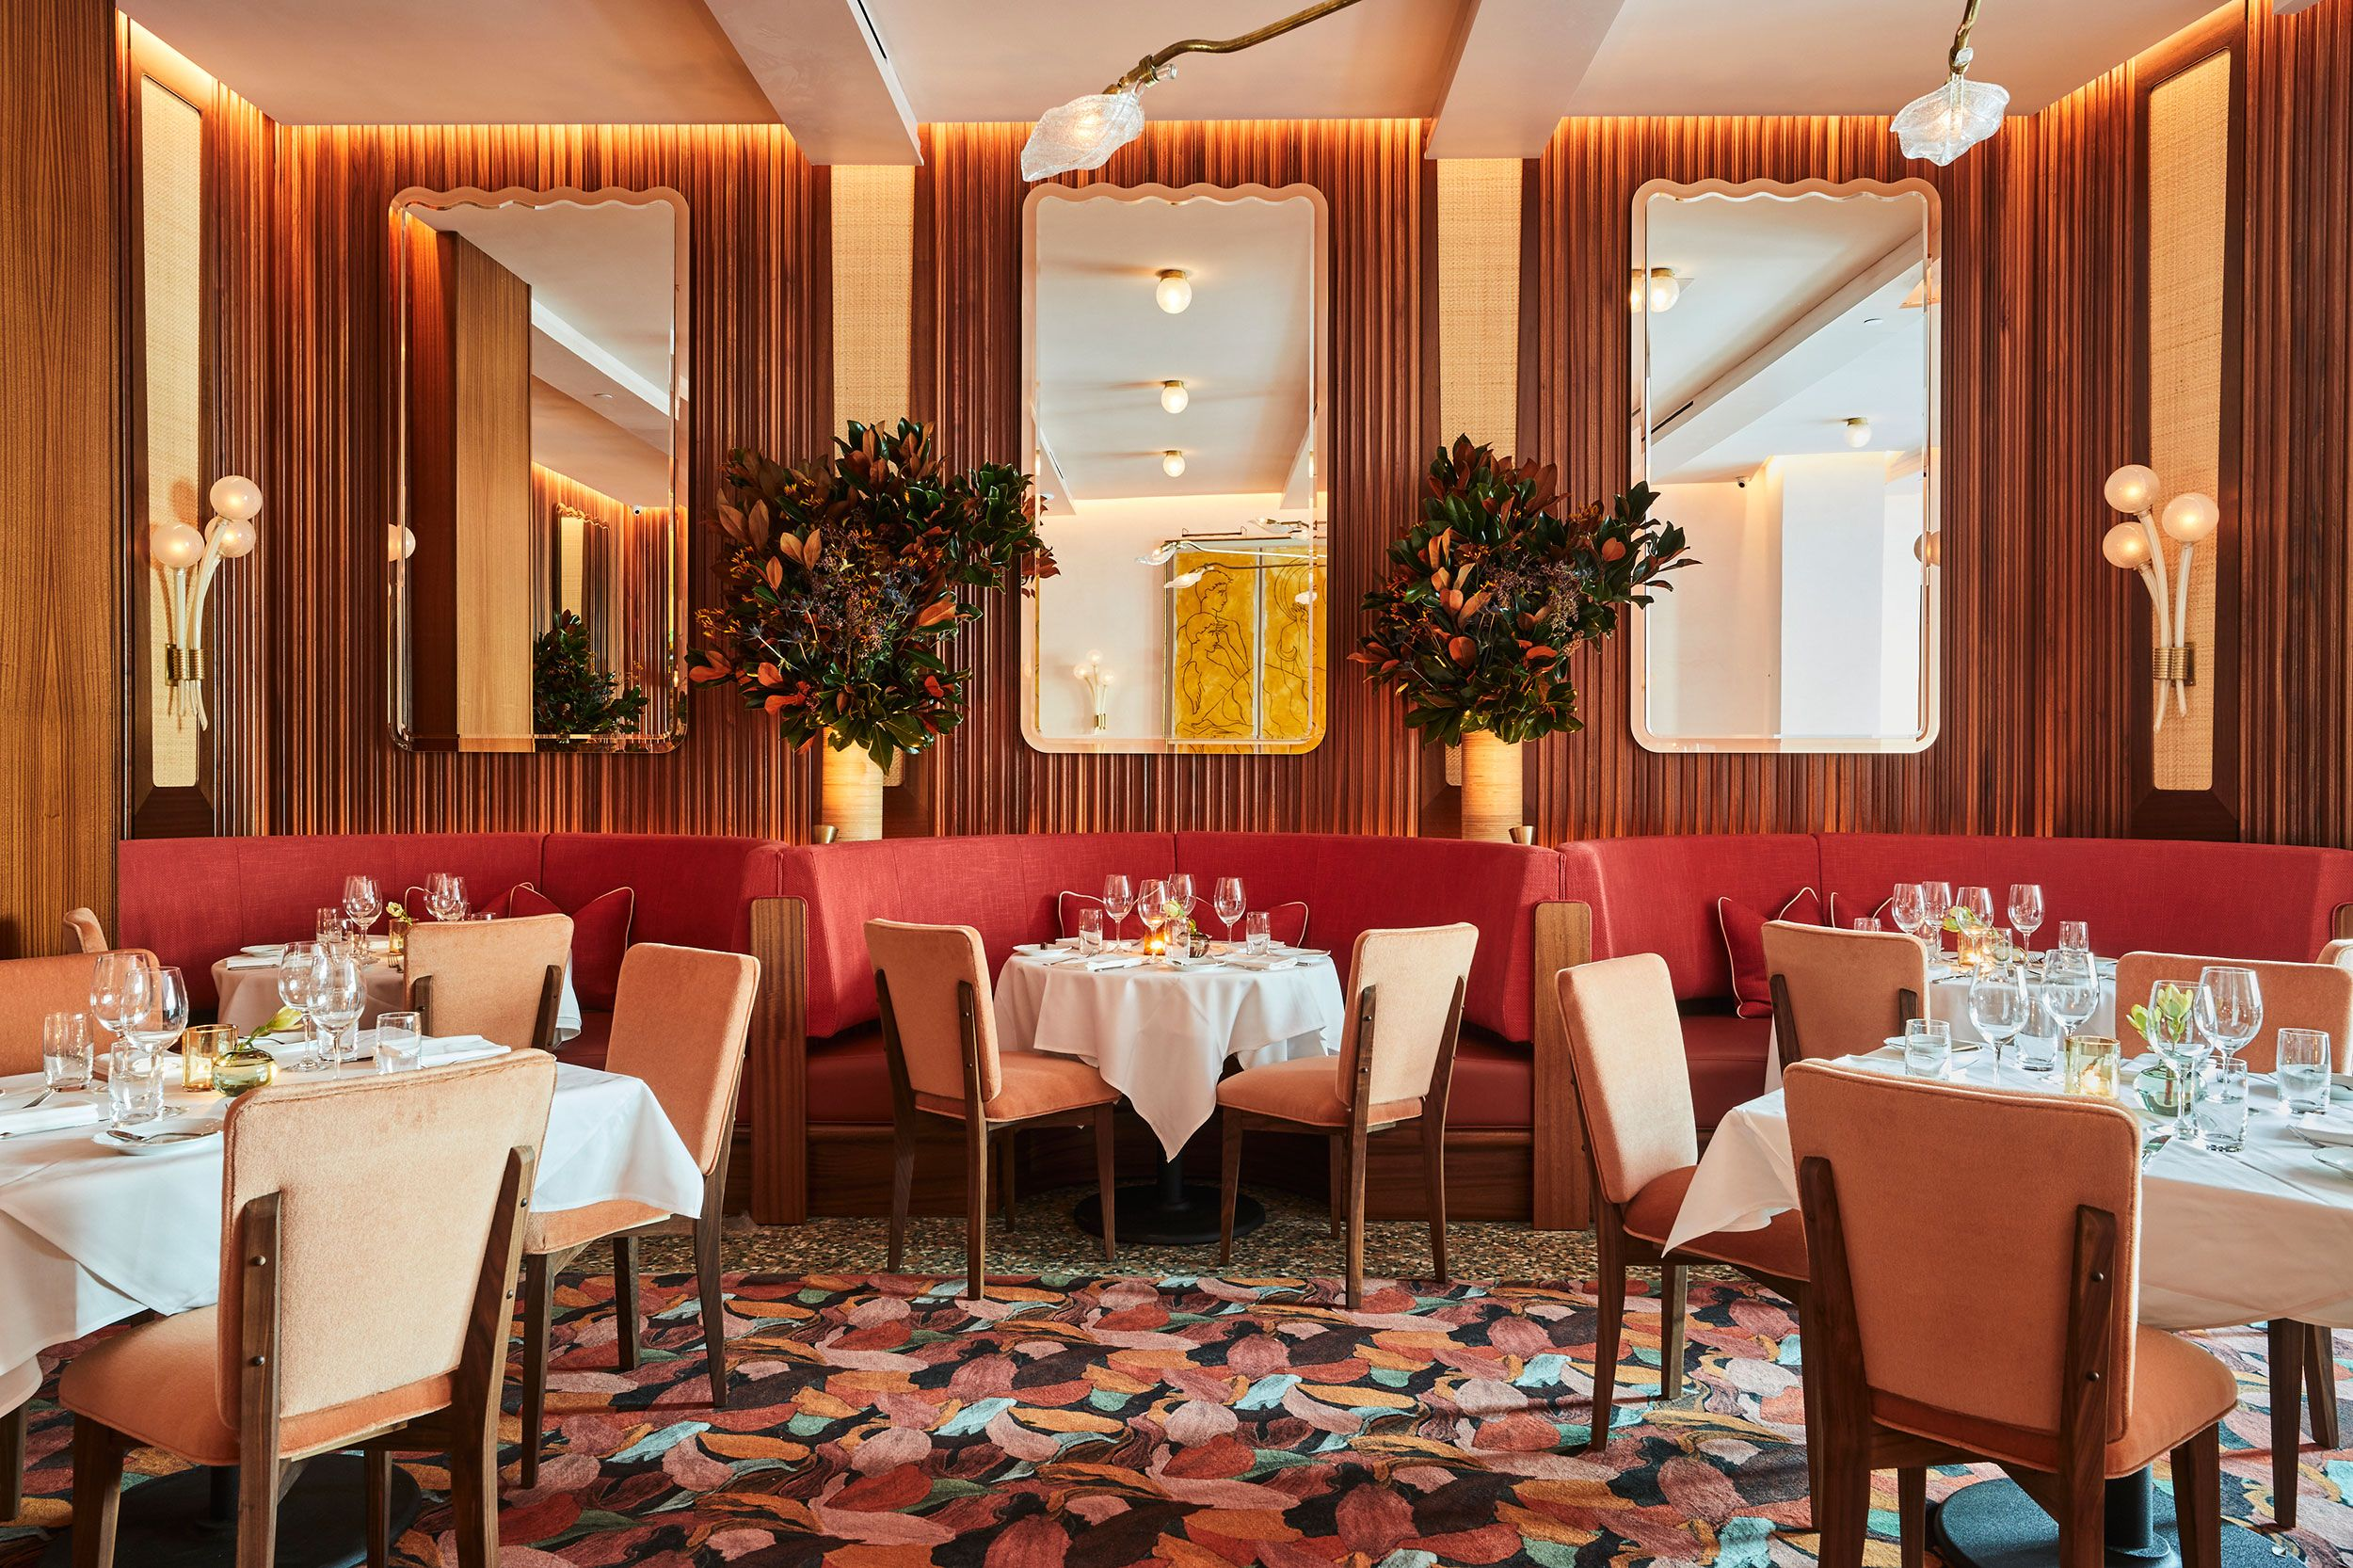 Step Inside Lower Manhattan's Prettiest New Restaurant